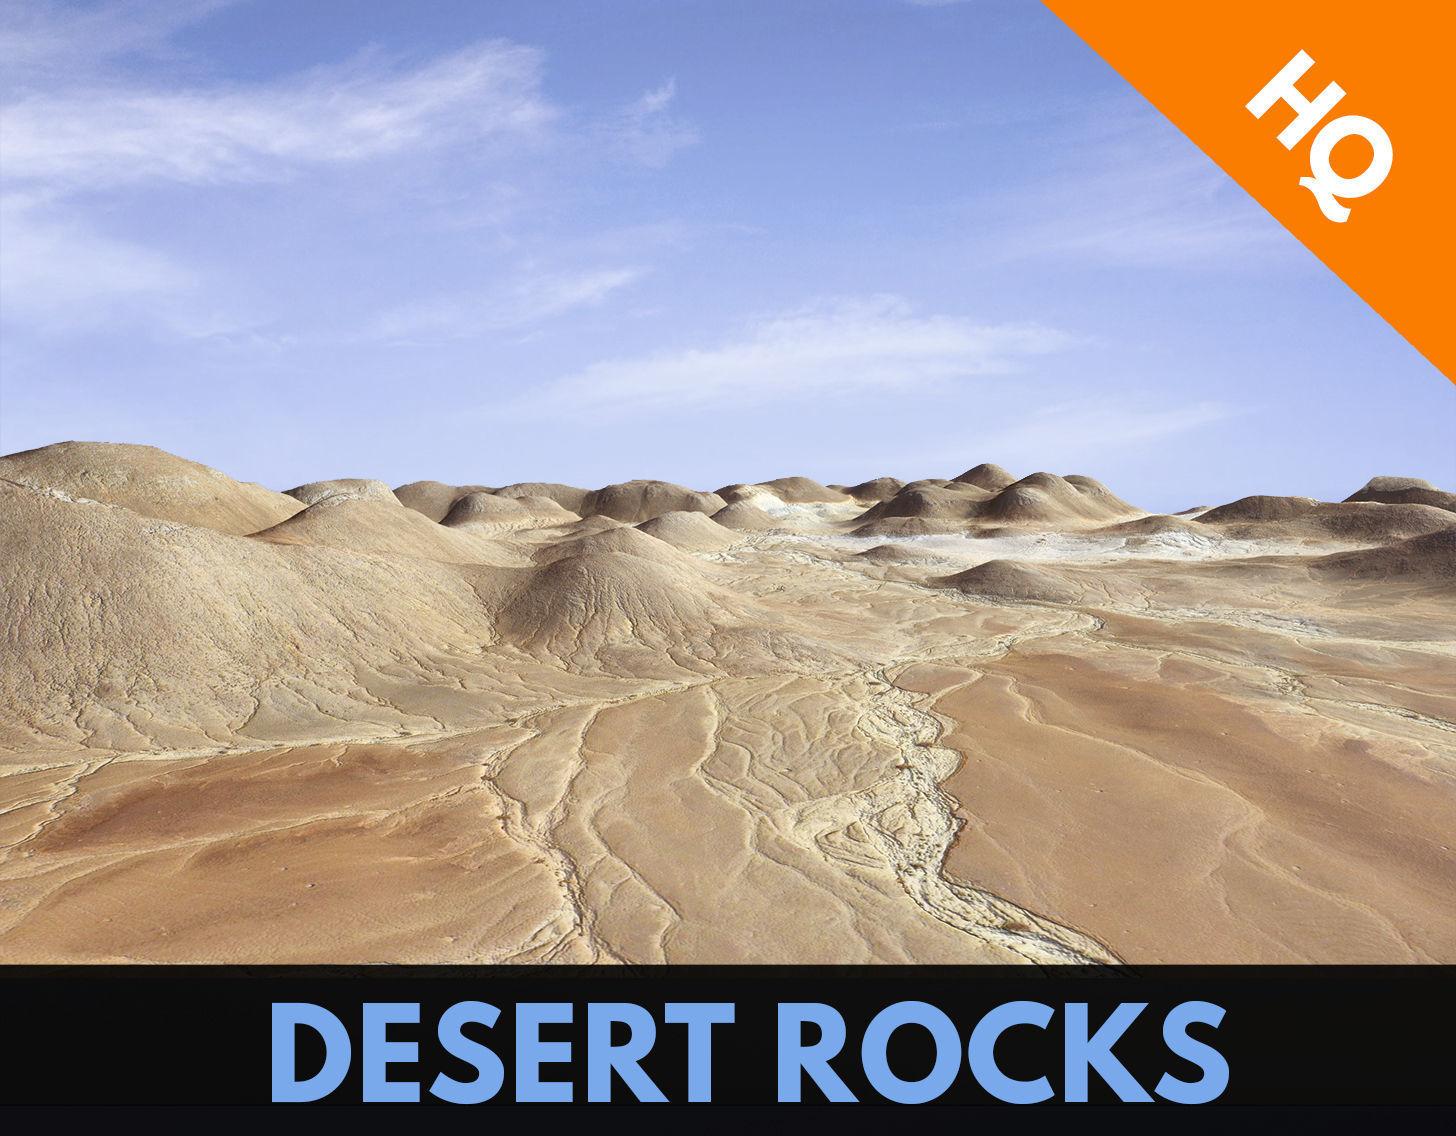 Rocks Terrain Cliffs Mountain Desert Landscape PBR Low Poly 05